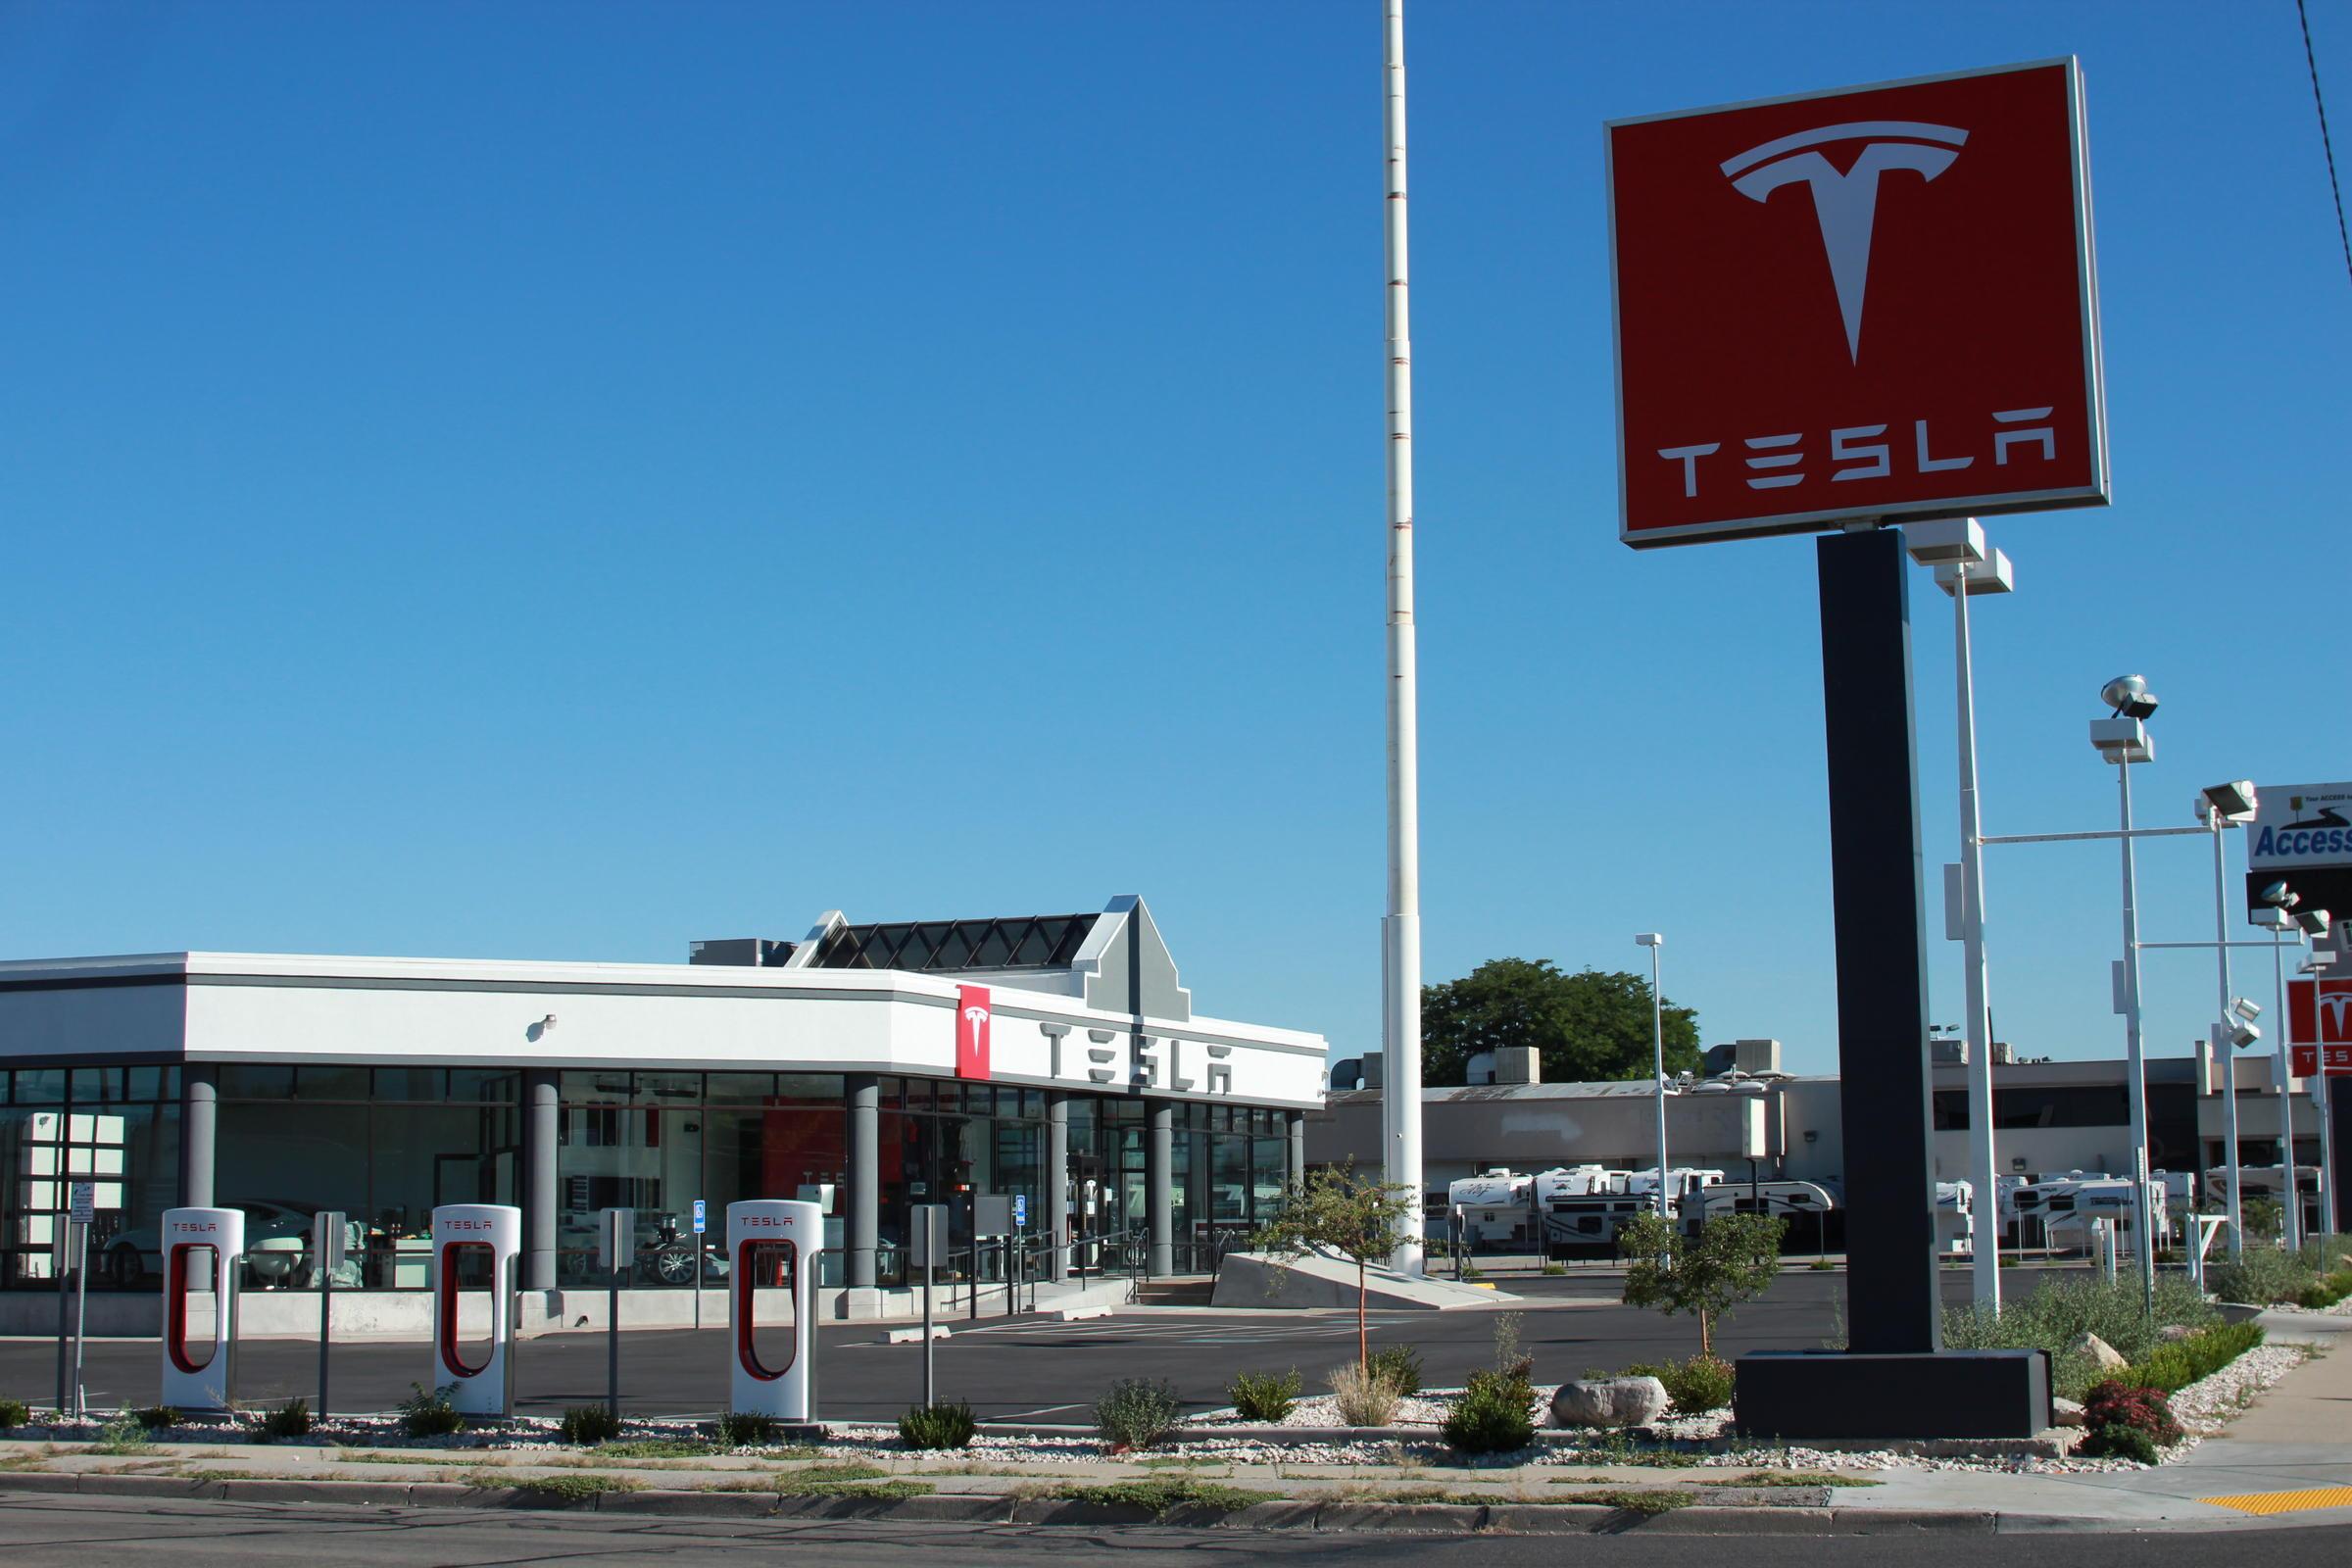 Tesla in utah